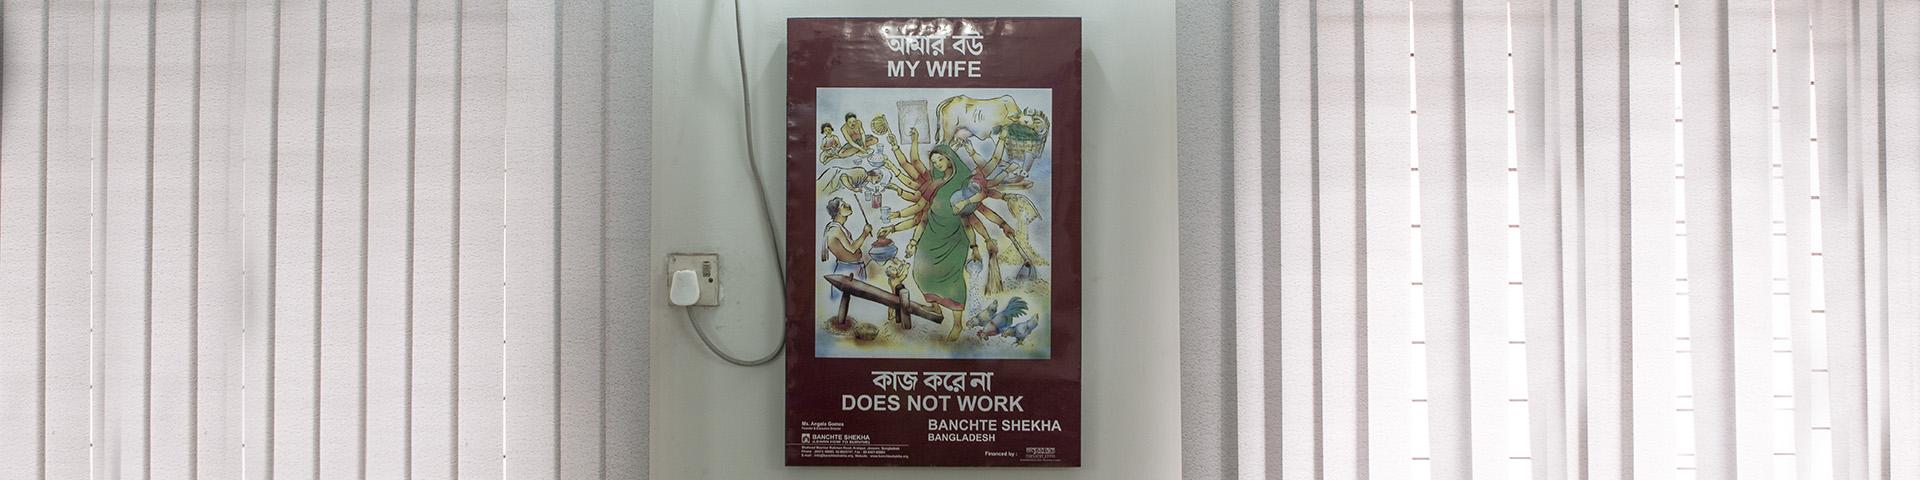 Bangladesh VK 017 ©Mike Roelofs